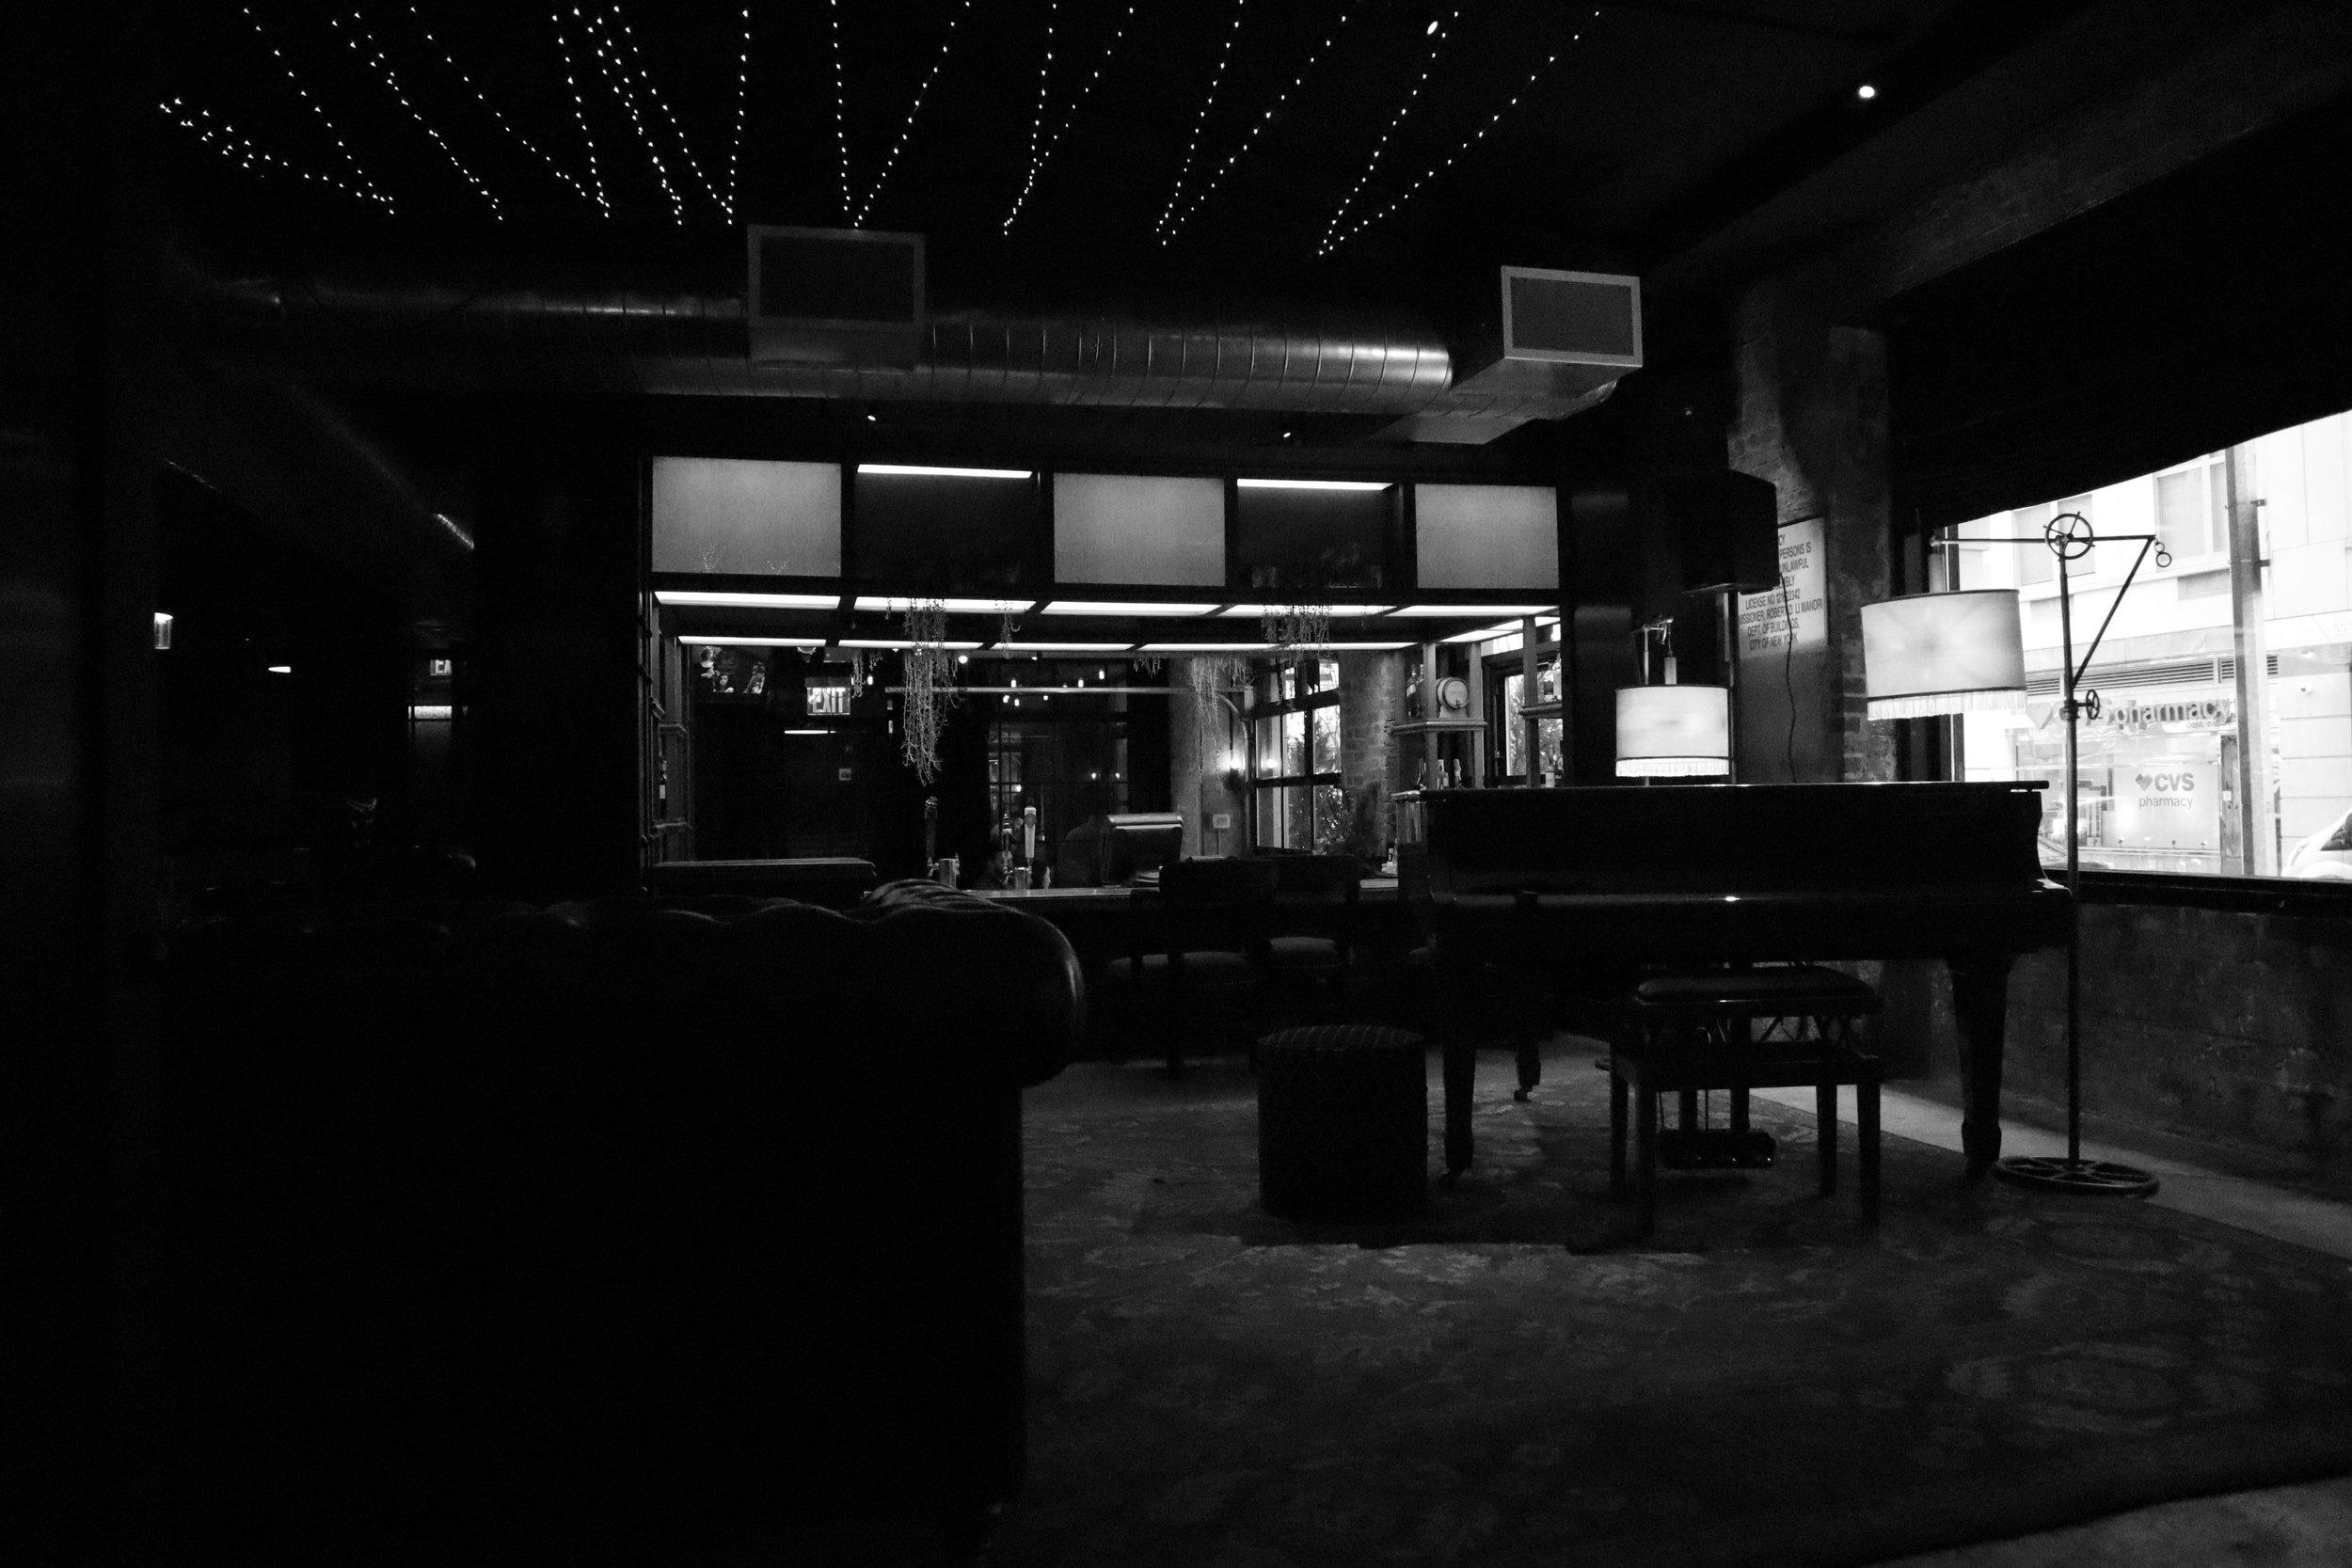 A hotel lobby in New York